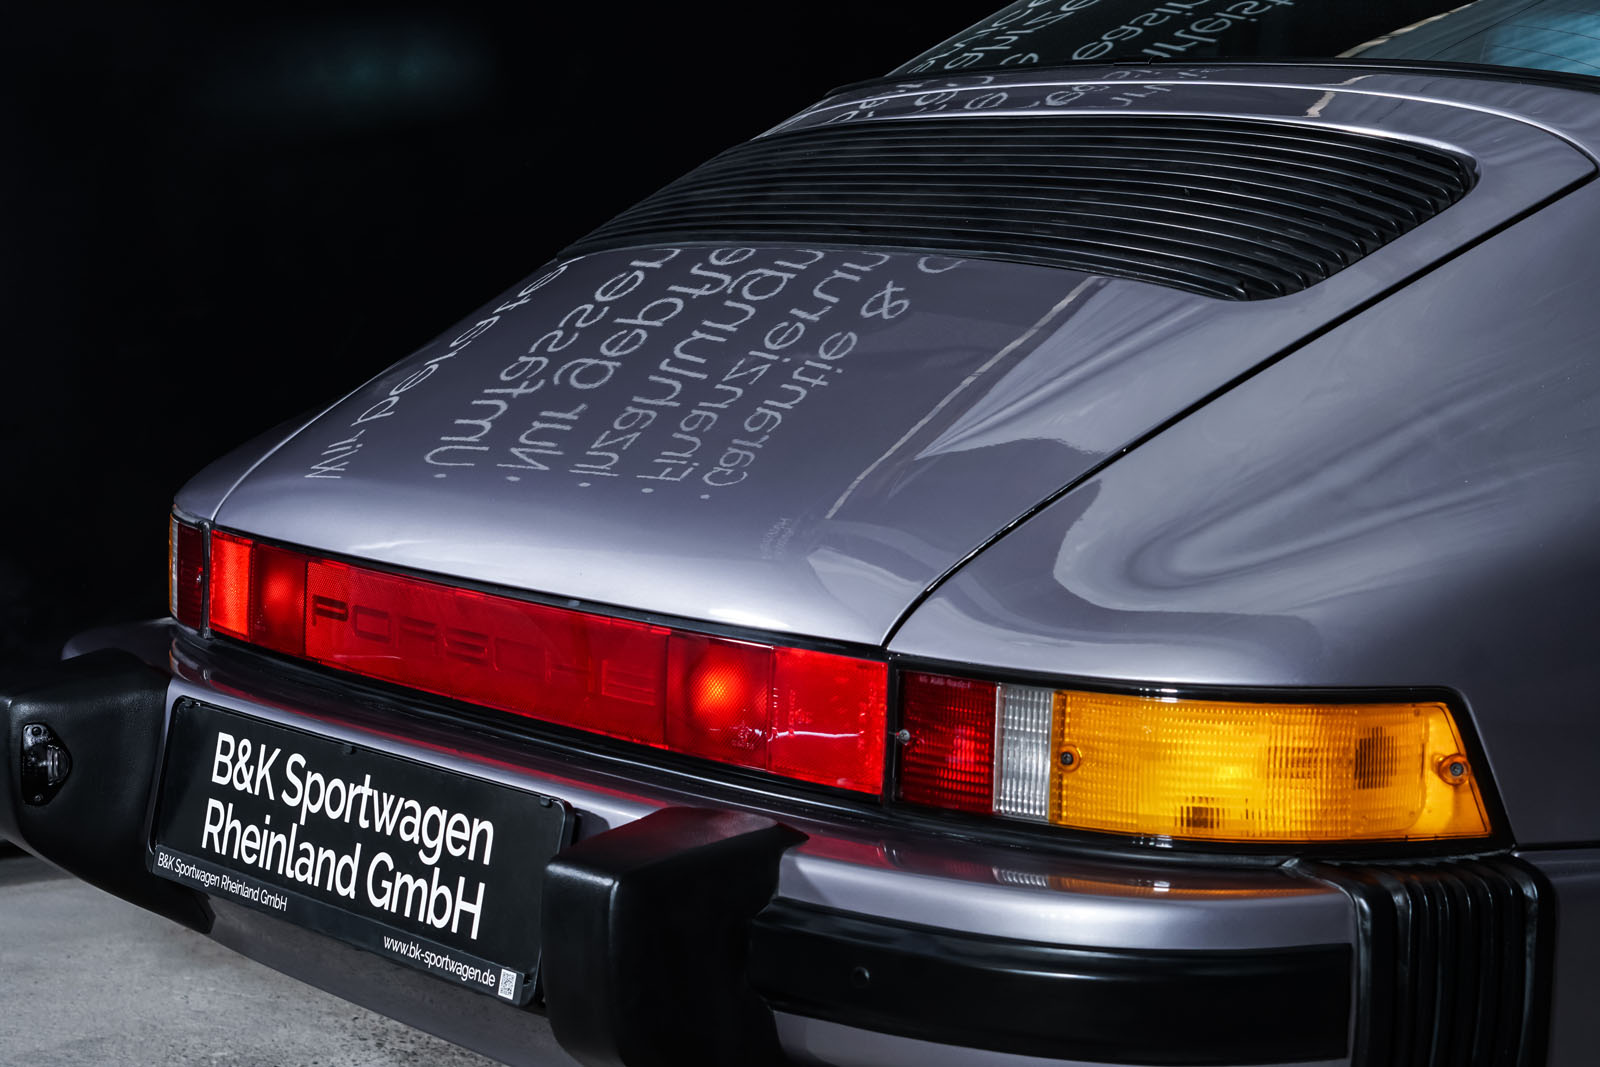 Porsche_911_Targa_Diamantblaumetallic_Blau_POR-0092_21_w